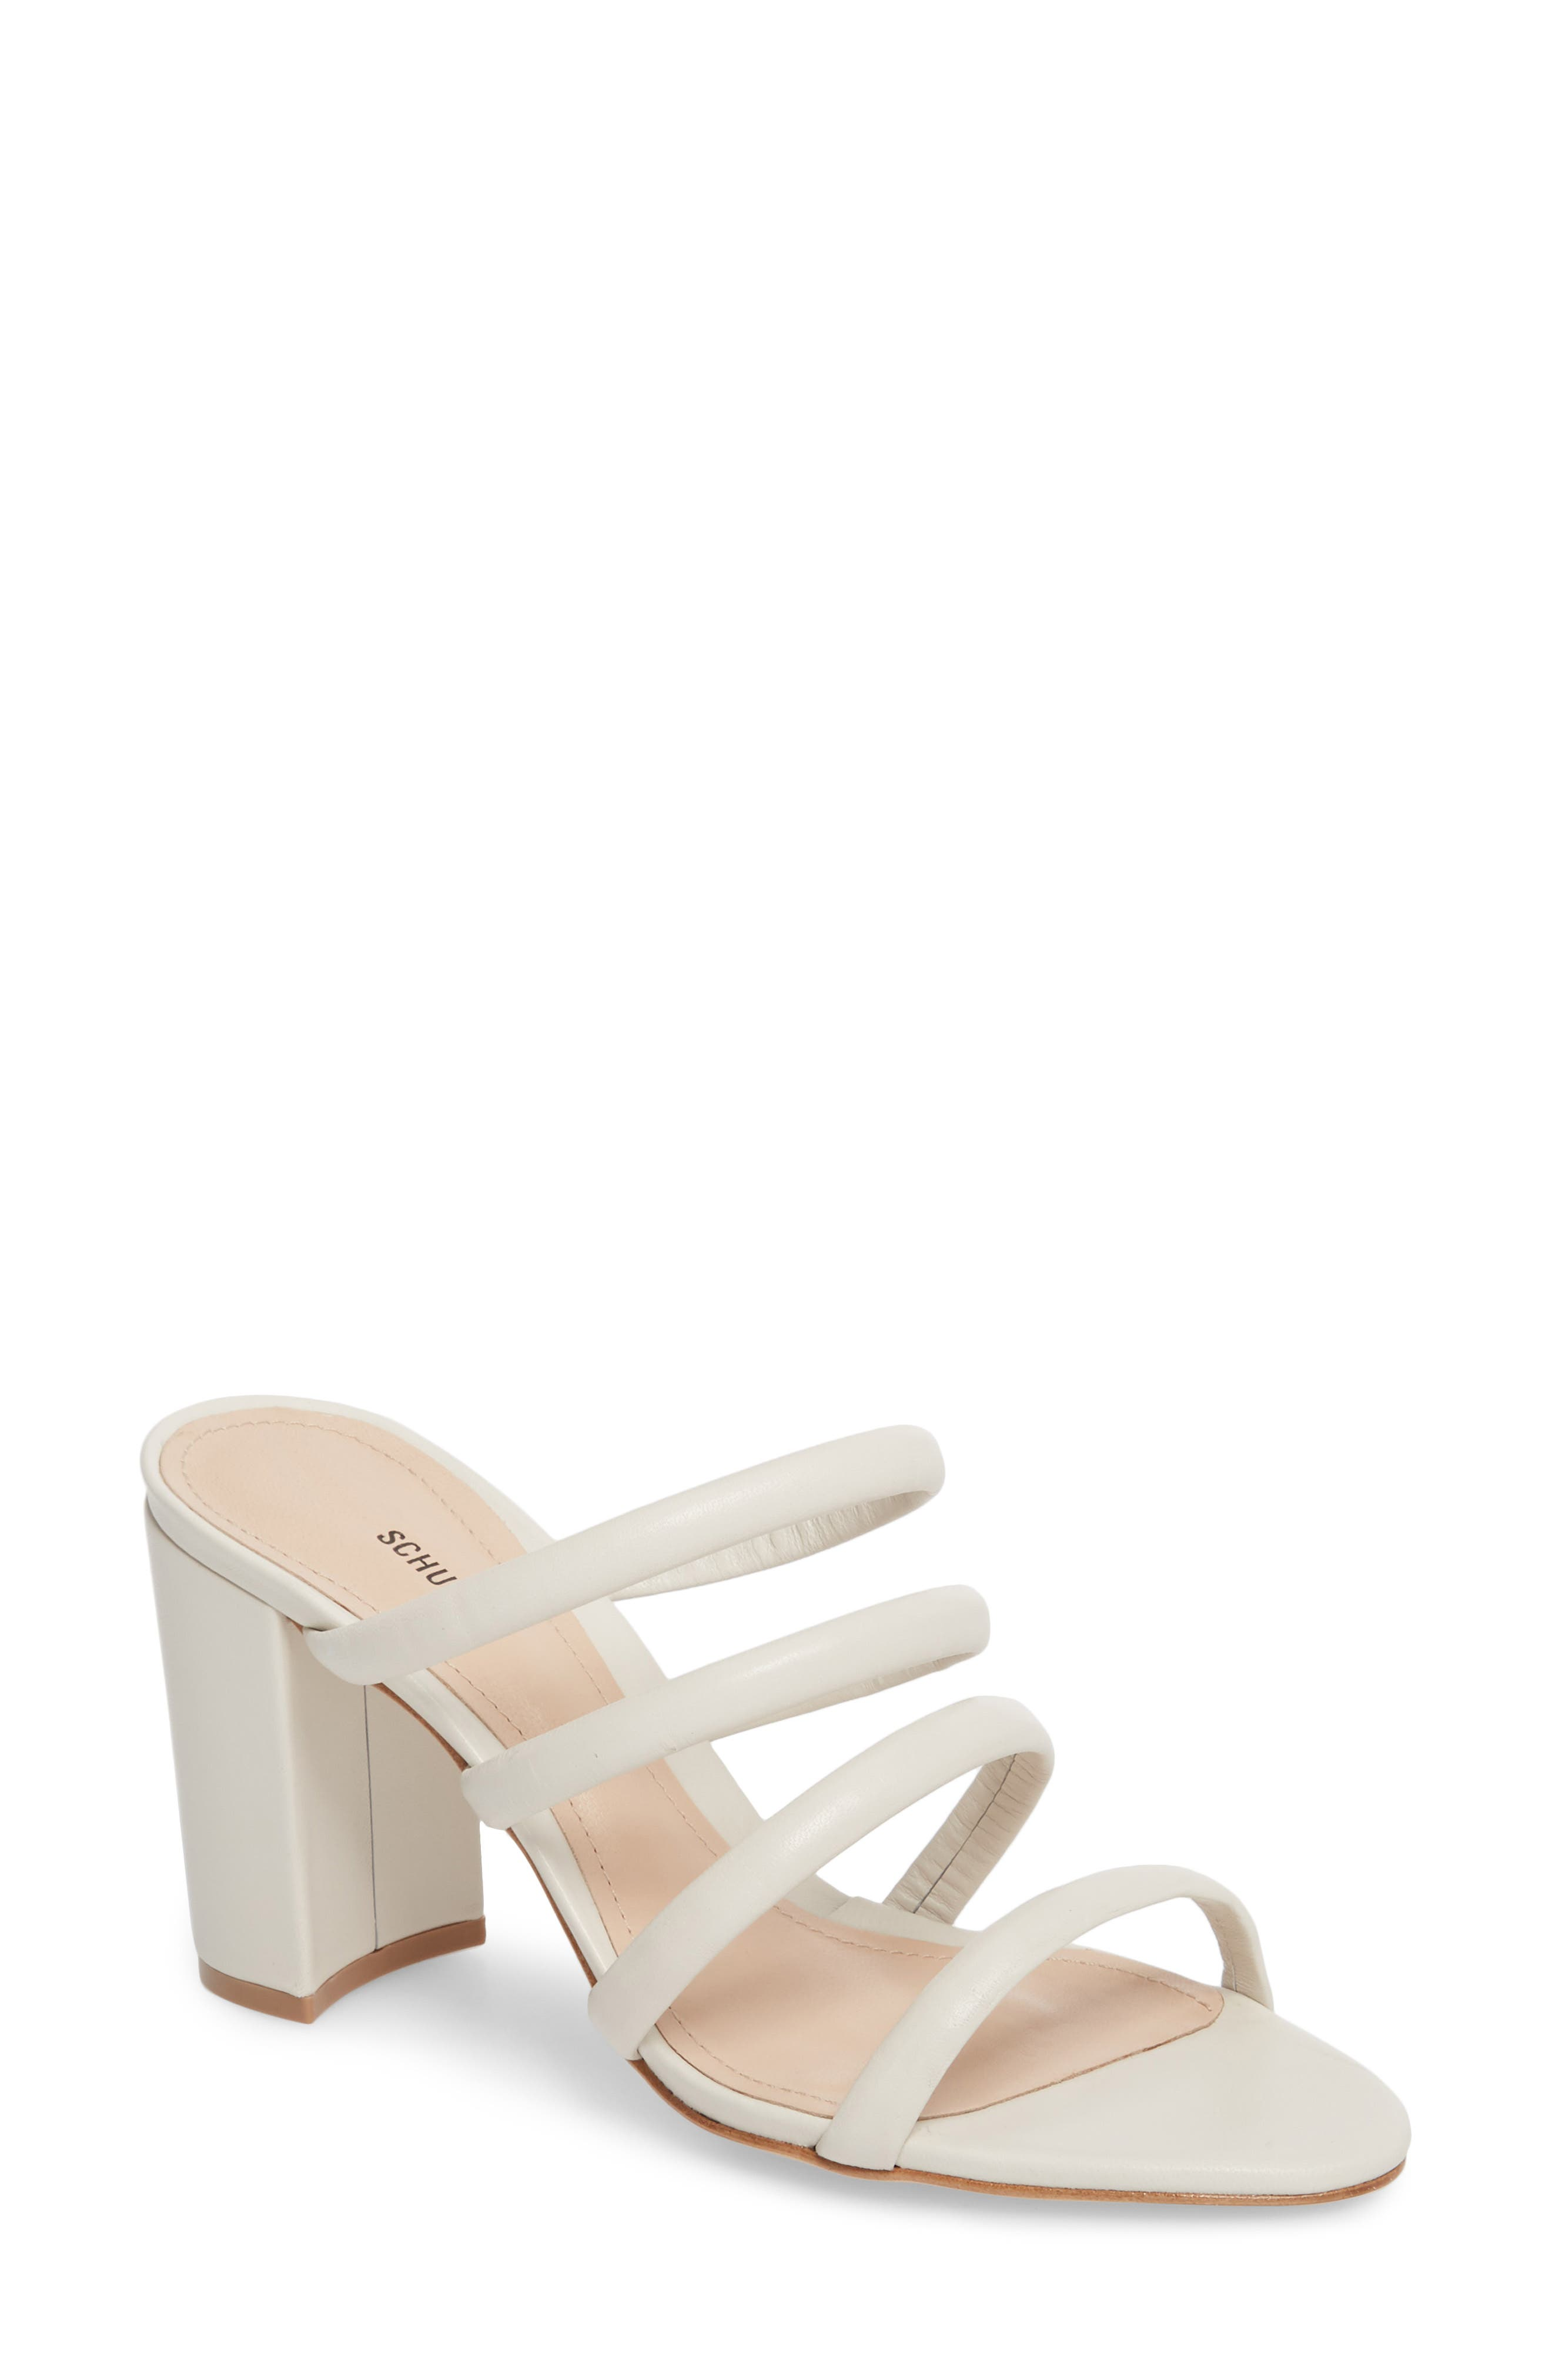 Felisa Block Heel Sandal,                         Main,                         color, Pearl Leather